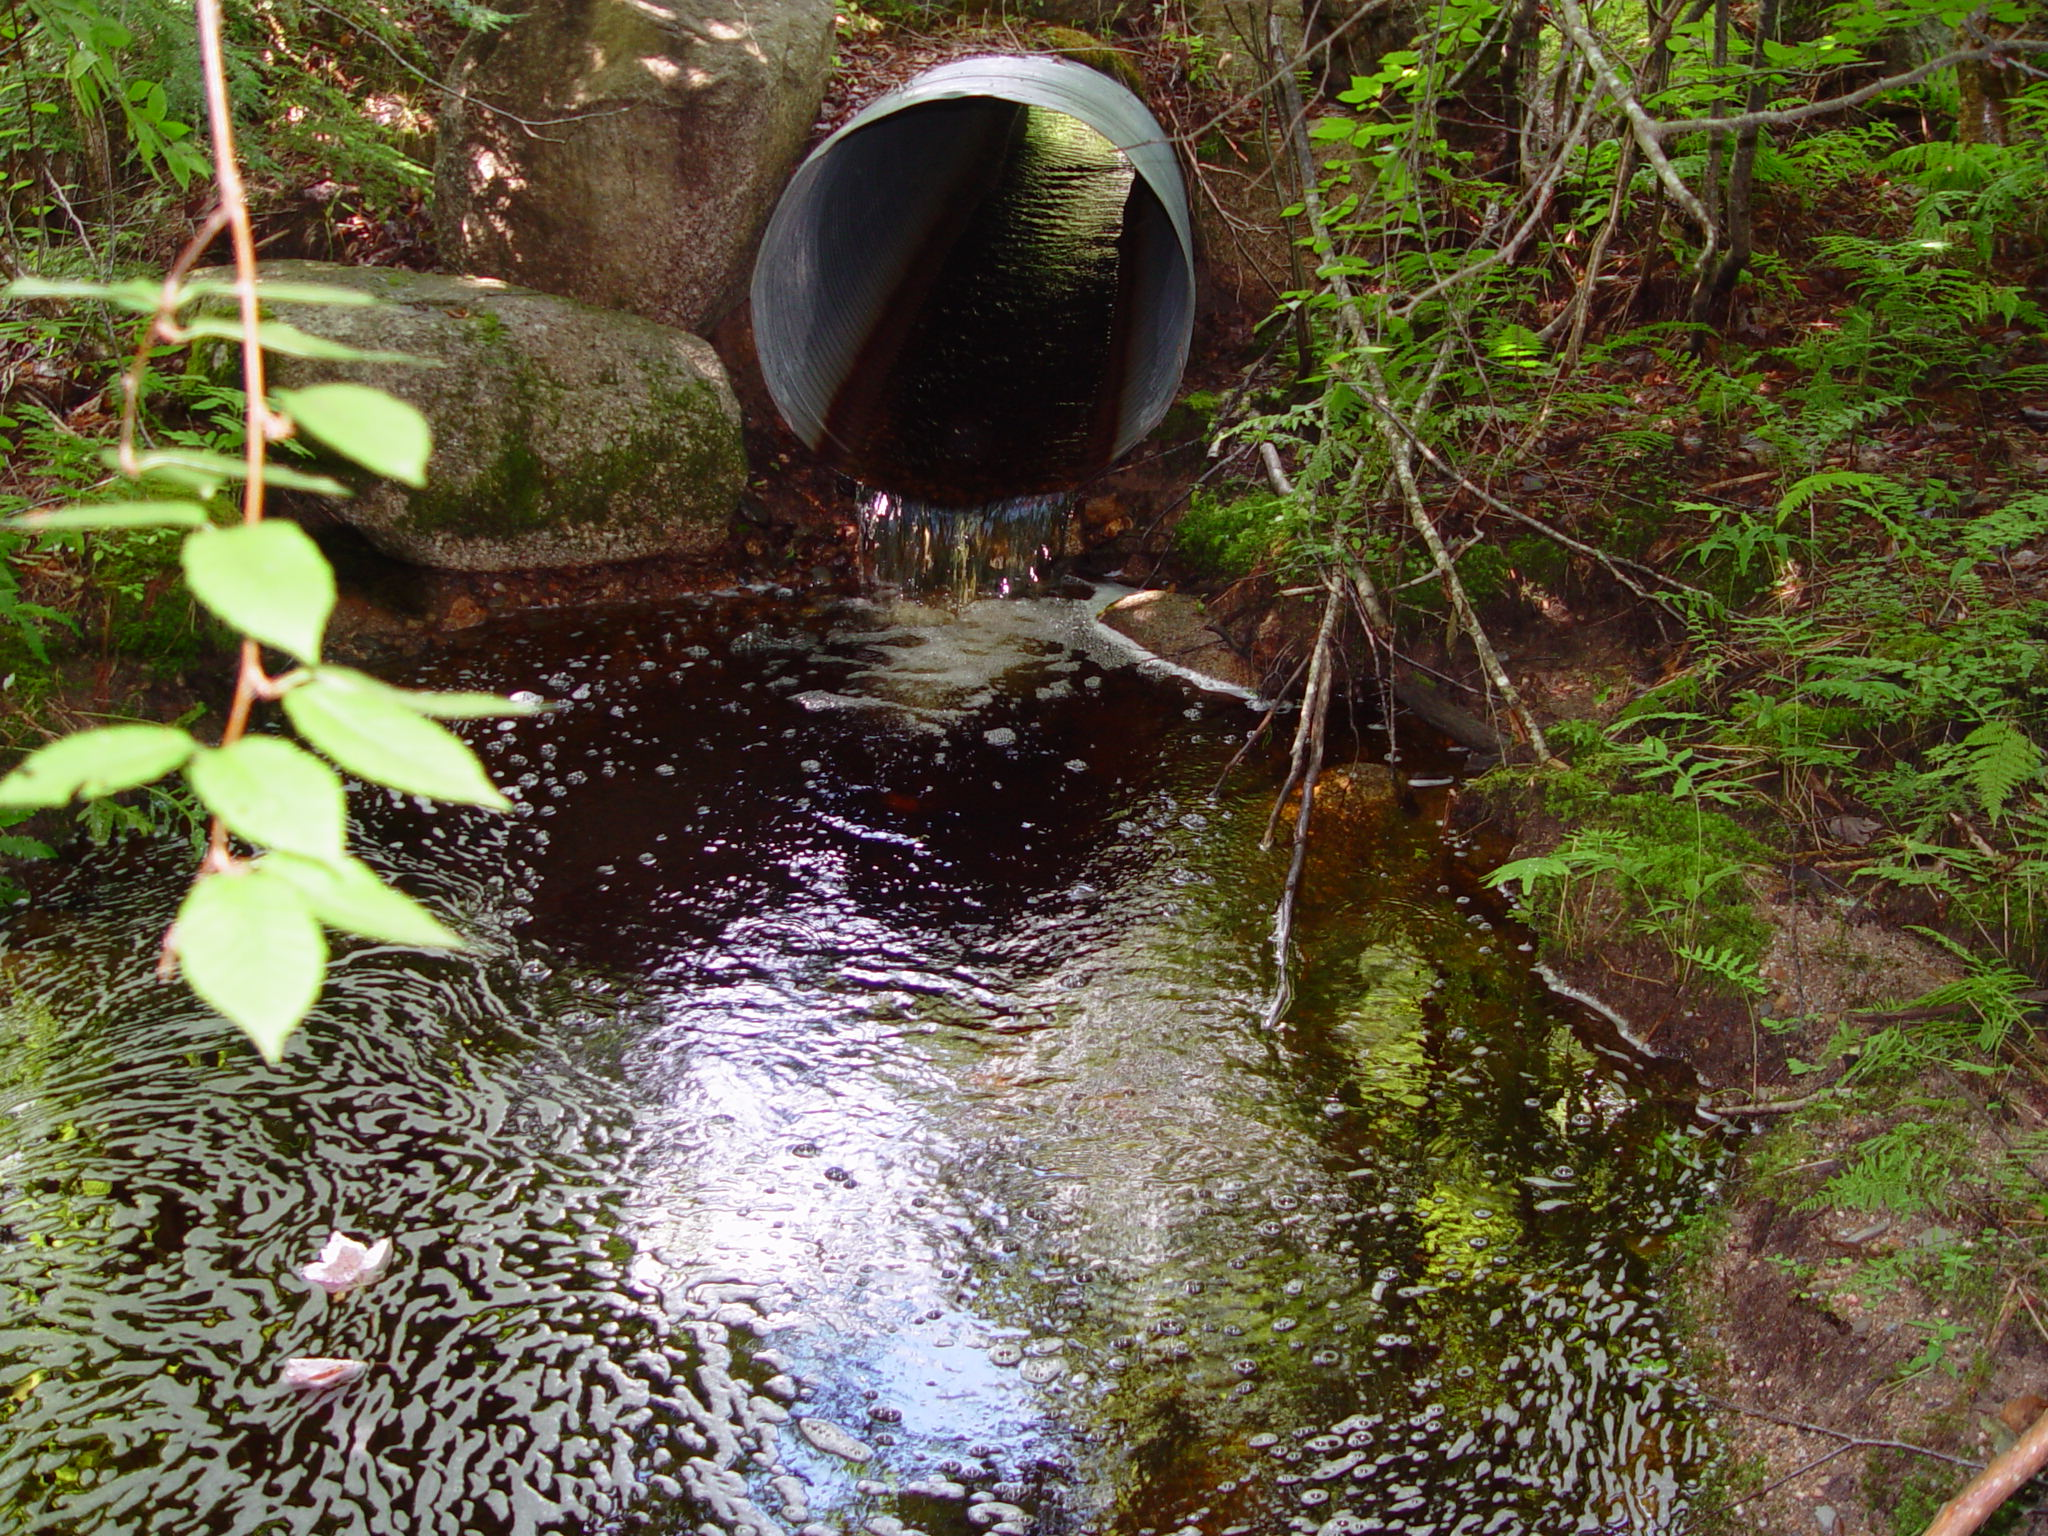 Culvert Outlet of Burroughs Brook Culvert, Machias River / St. Croix River Maine